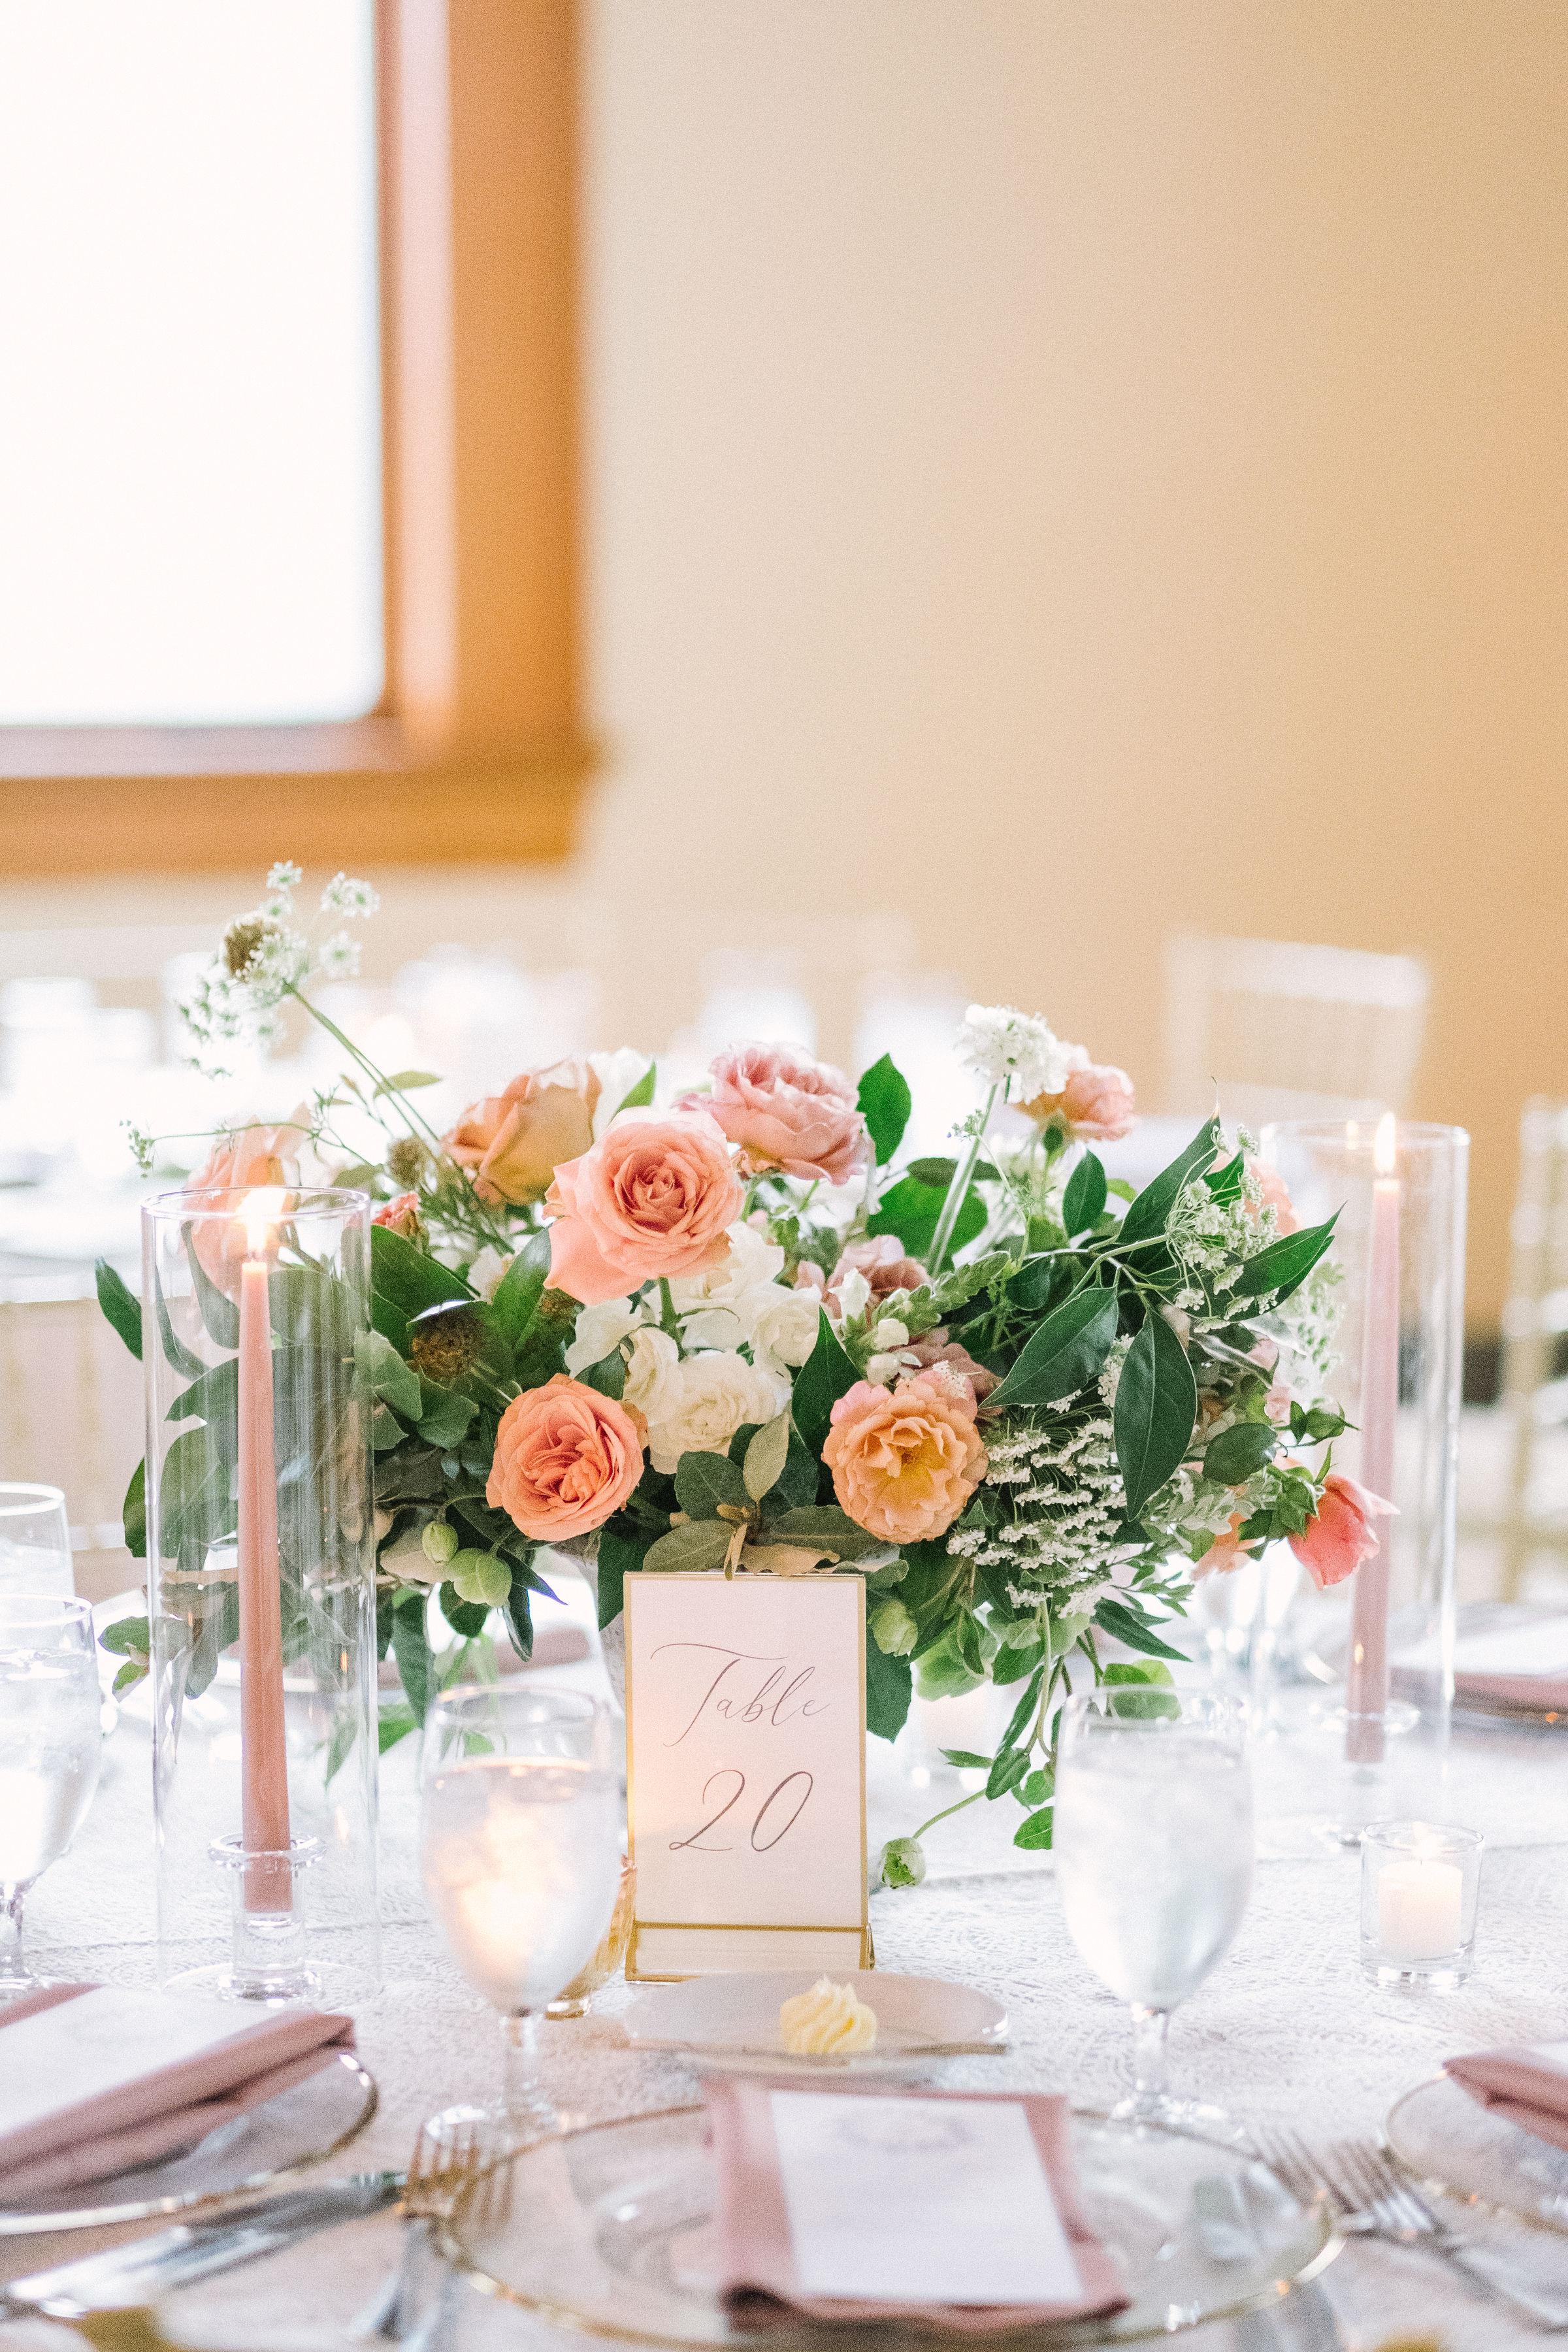 Ellen-Ashton-Photography-Girt-and-gold-events-weddings-Ashton-Depot-Weddings709.jpg